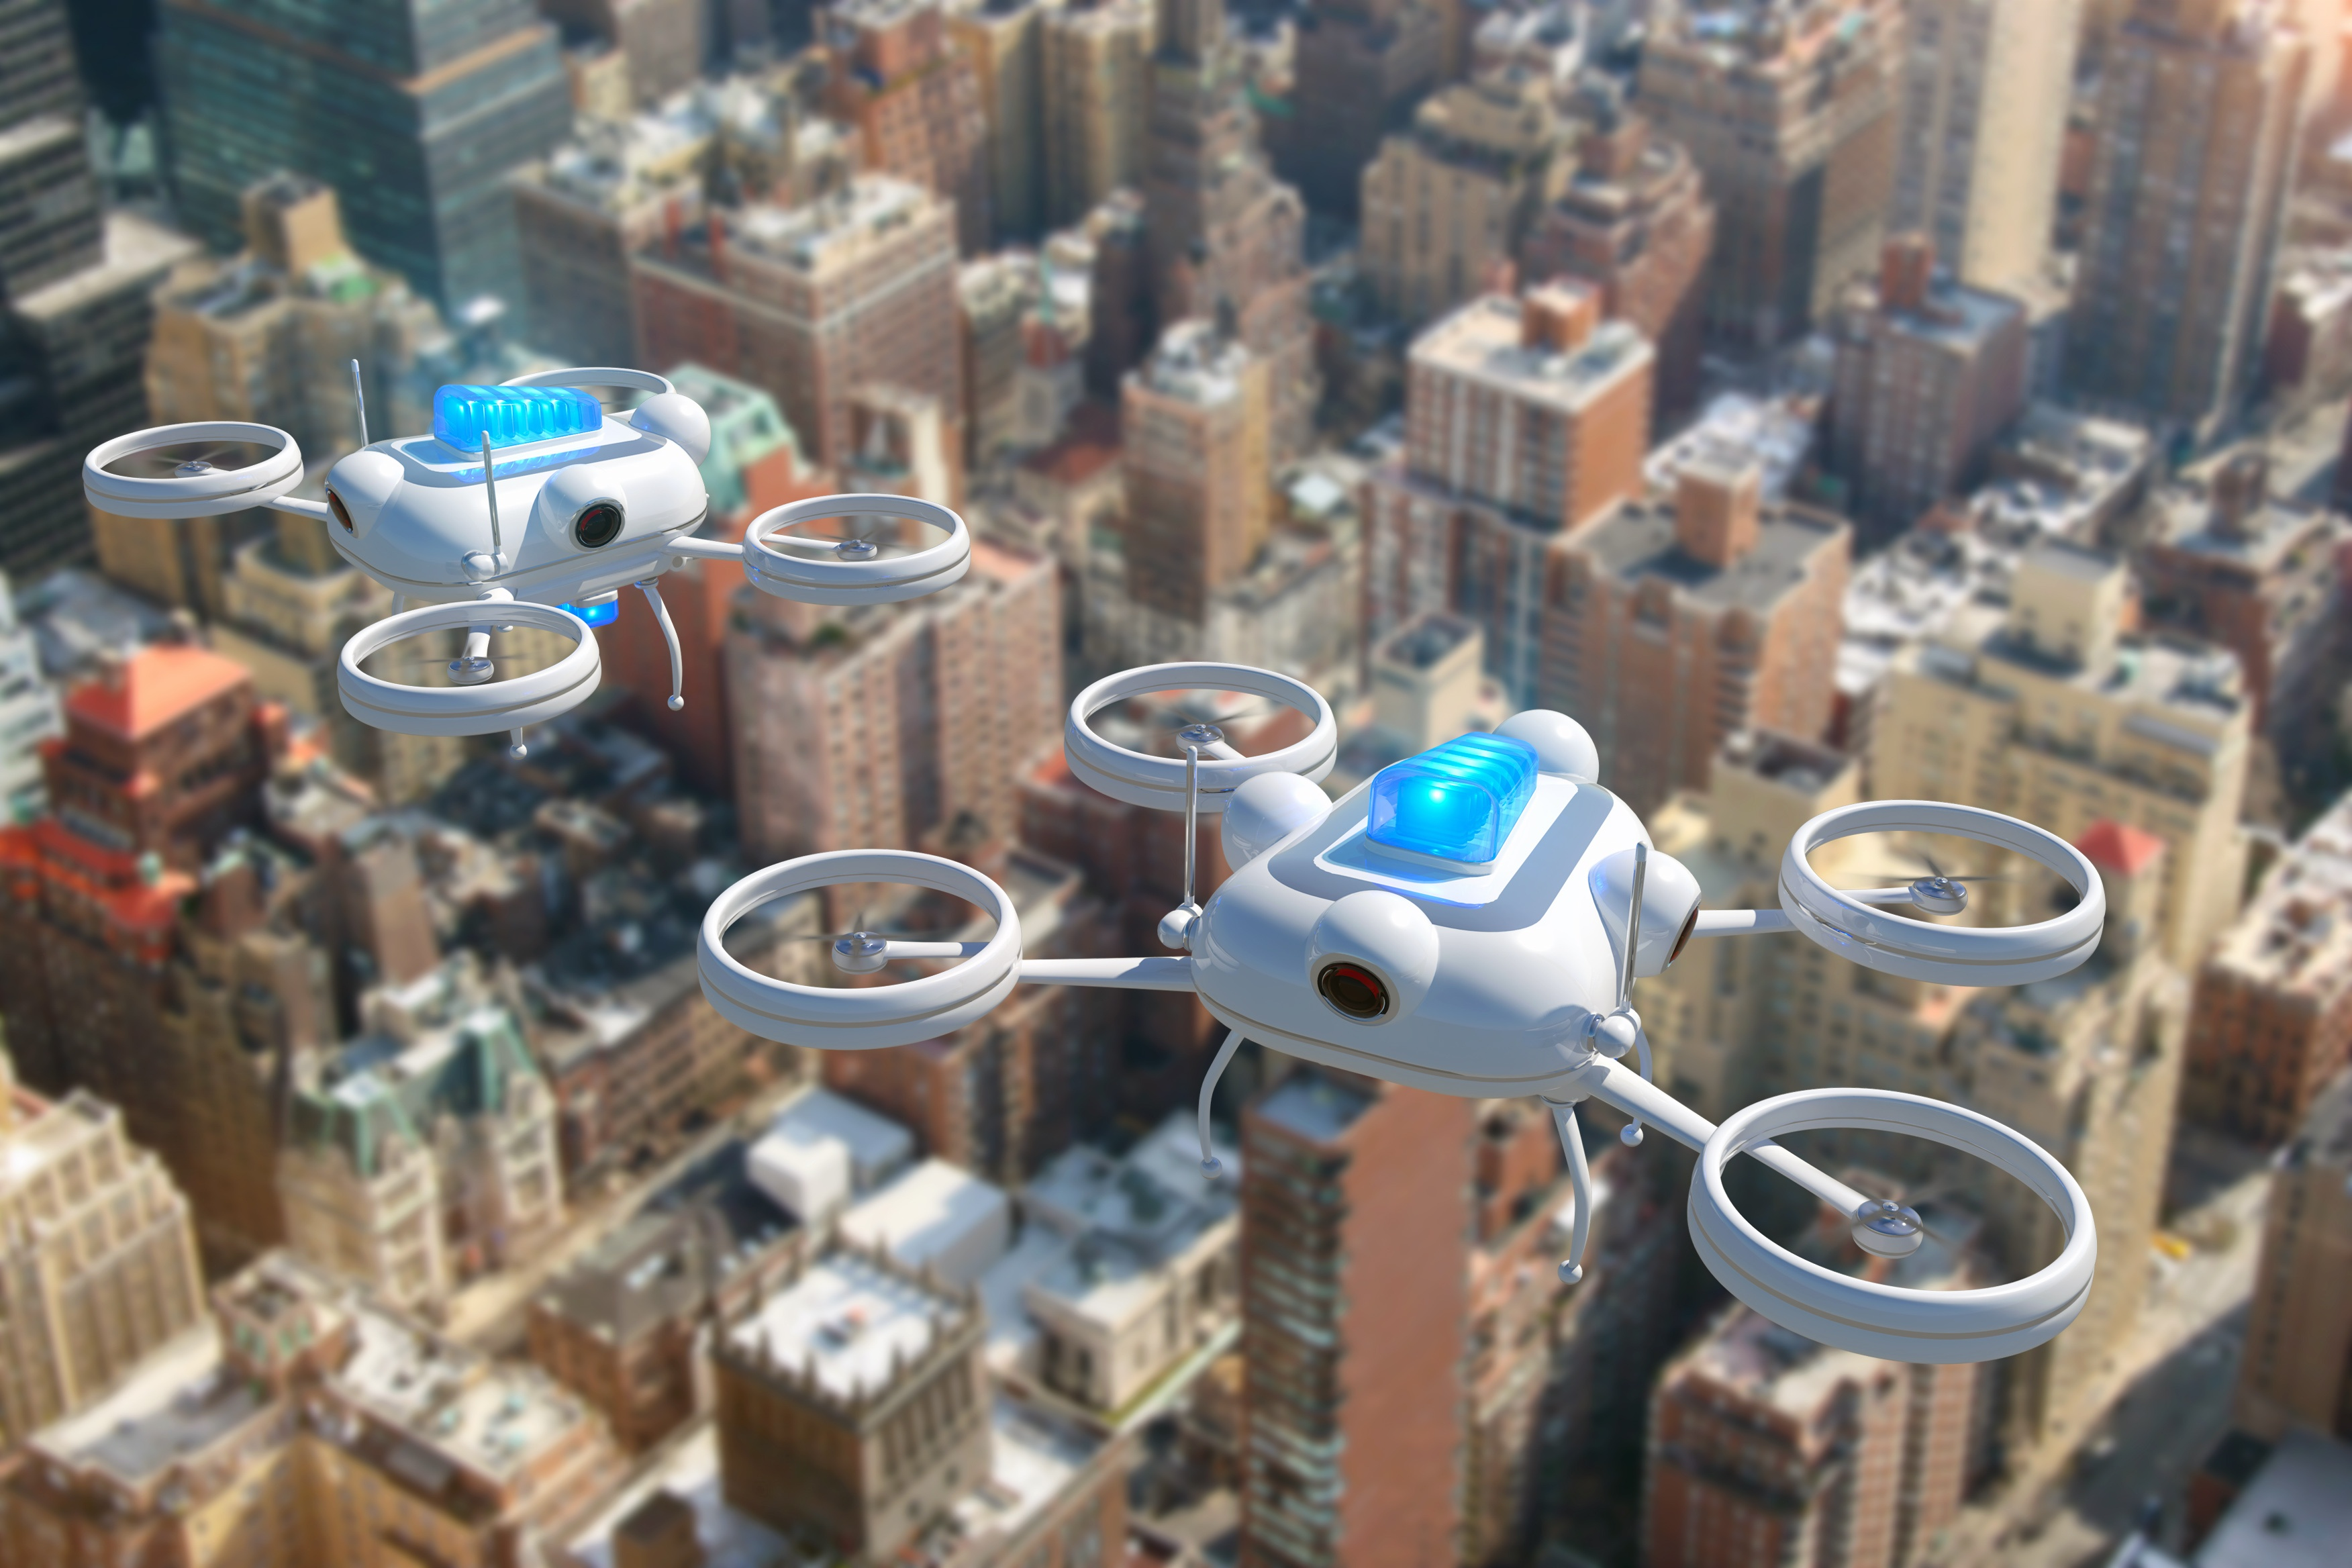 drones-publicsafety.jpg